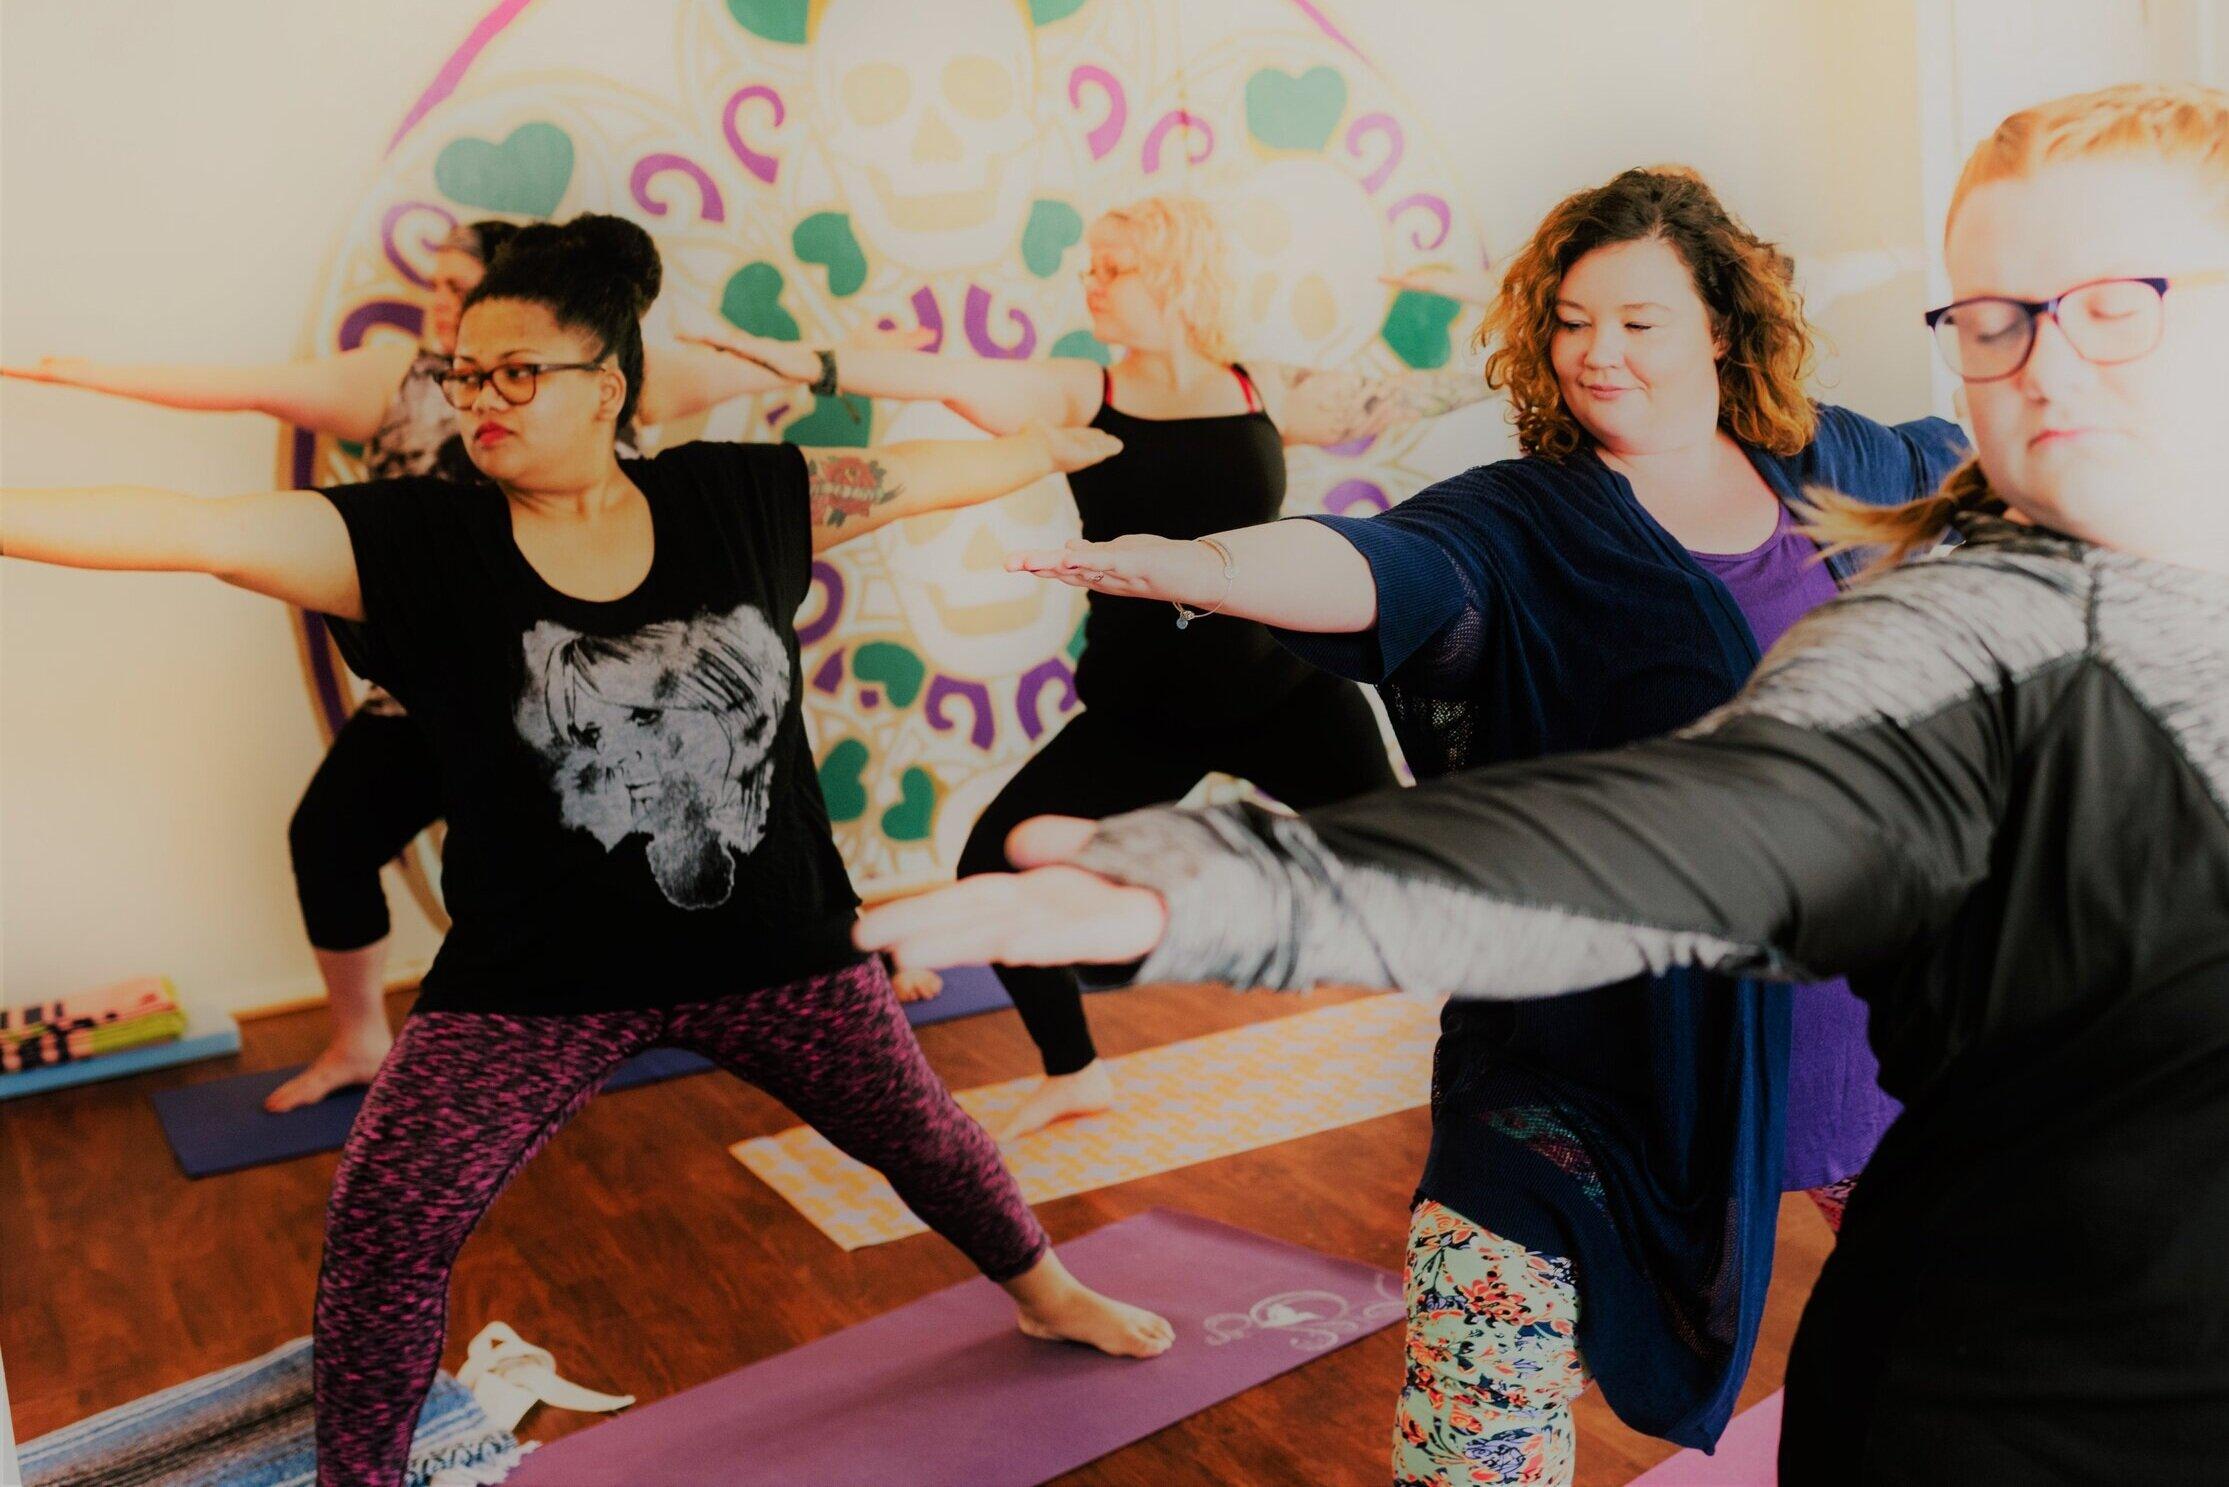 Curvy Yoga - Tuesday 6:30 pm